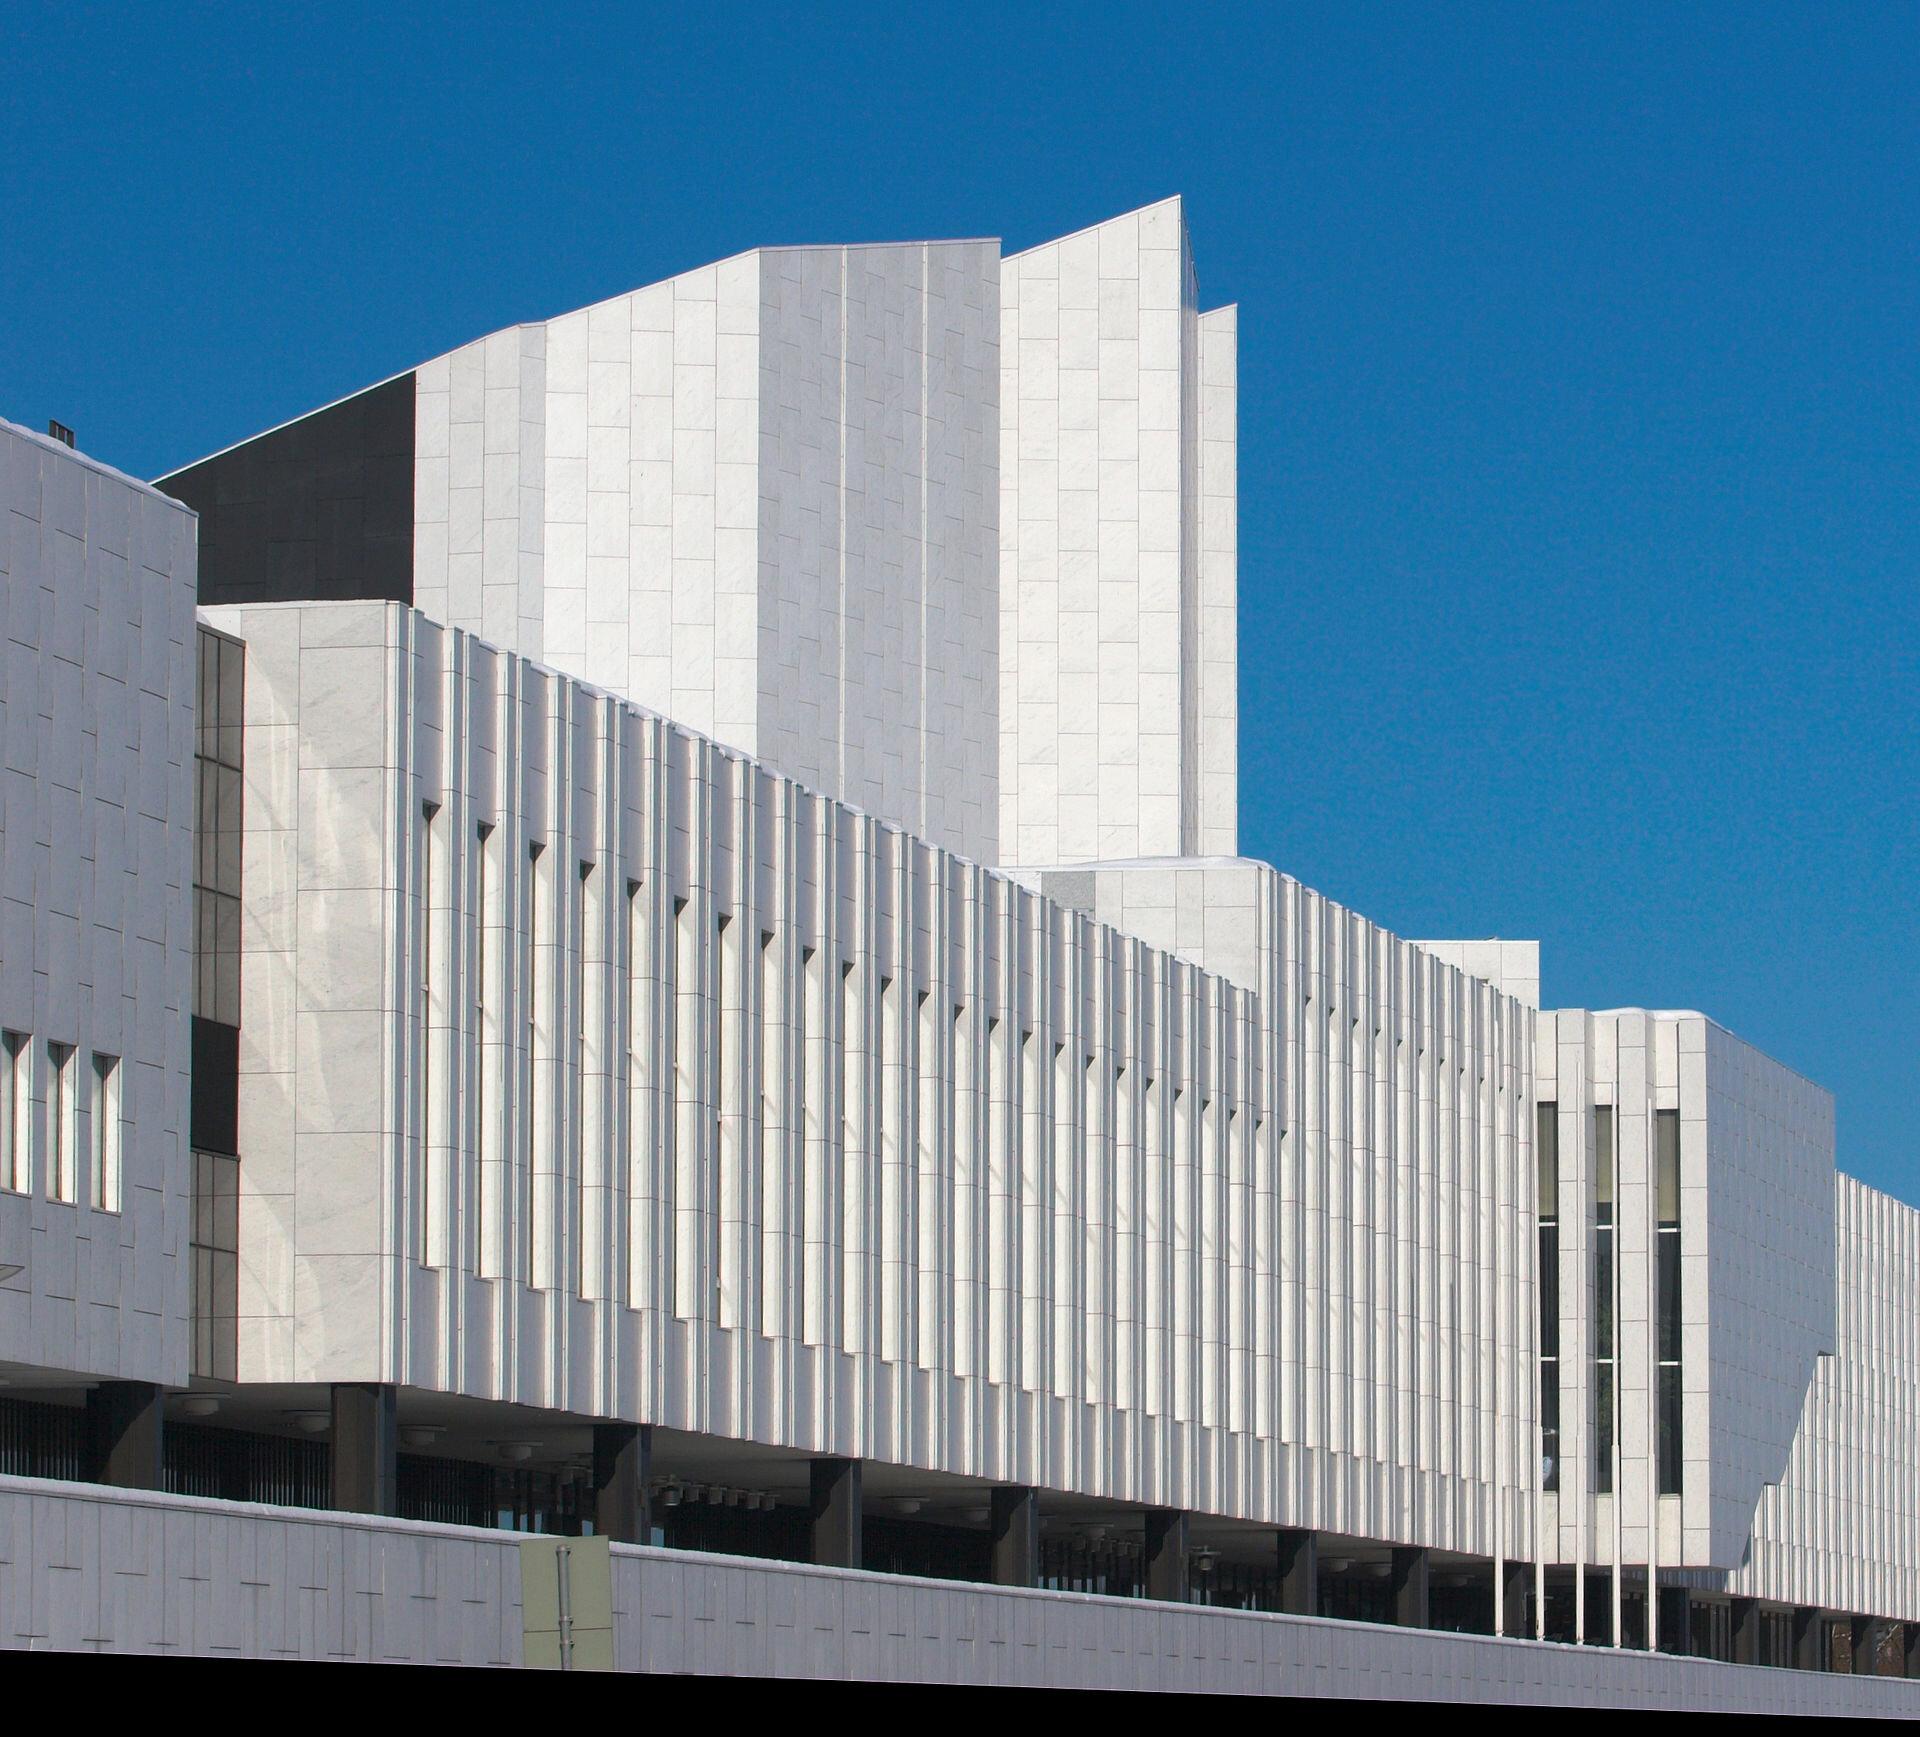 Finlandia Hall, Helsinki (1971)  Photo by: Rune Snellman